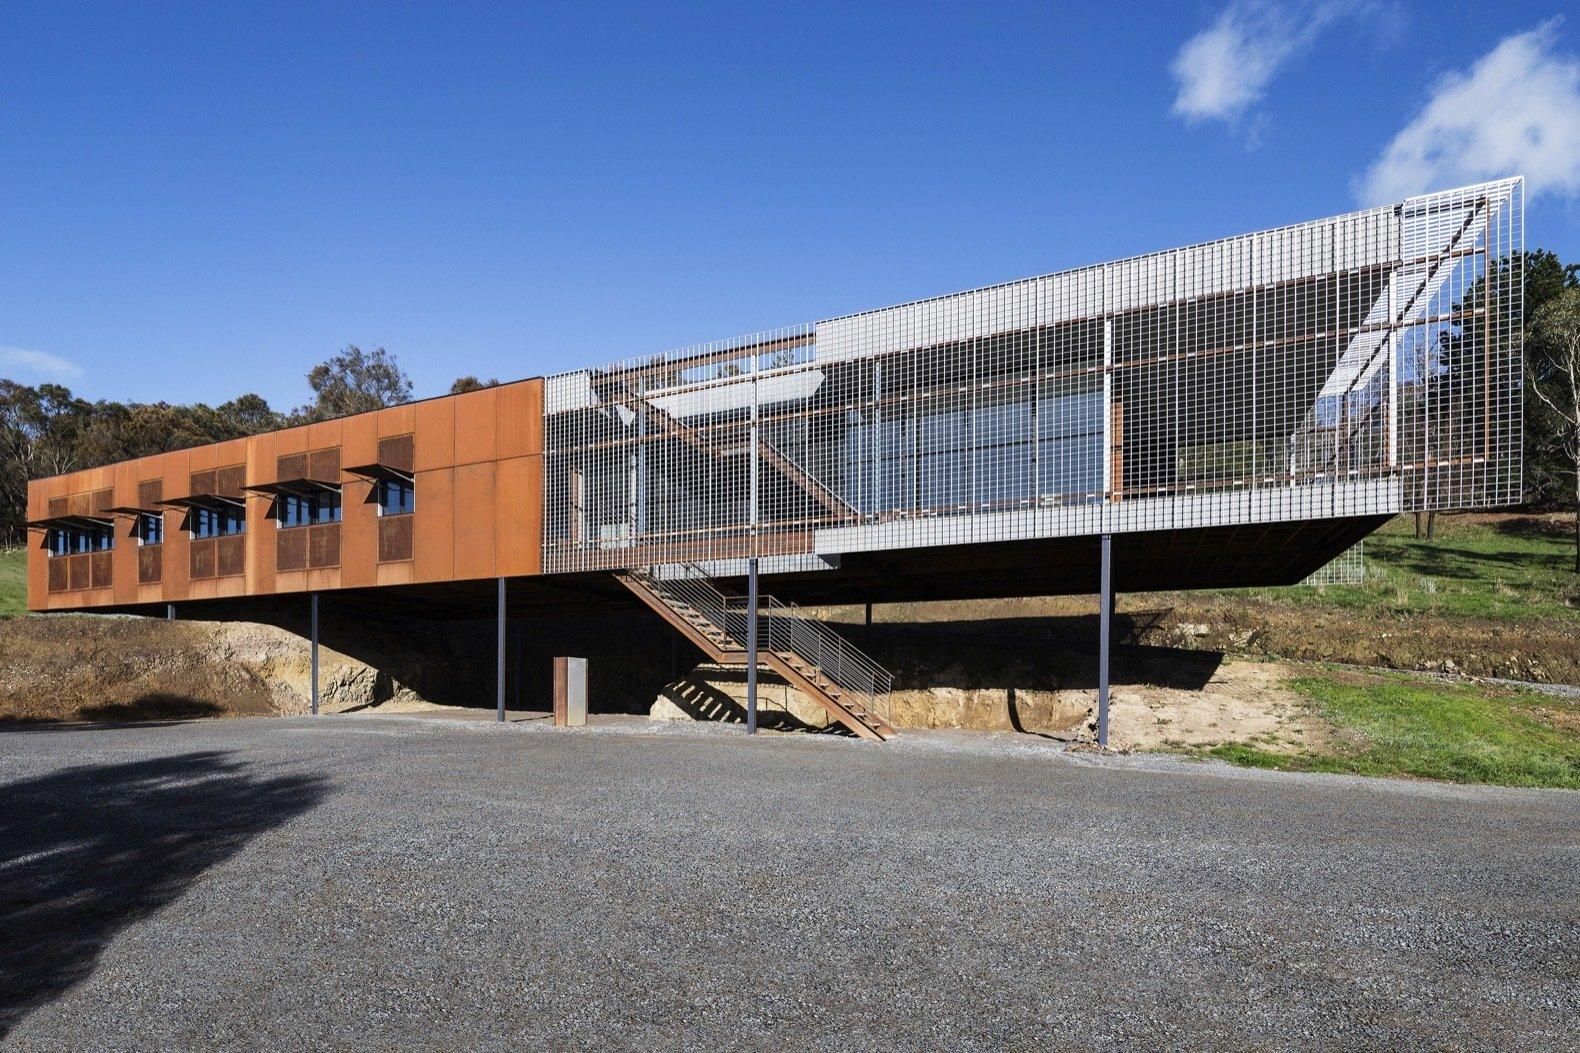 A Fire-Resistant House Cuts a Striking Figure in the Australian Bush